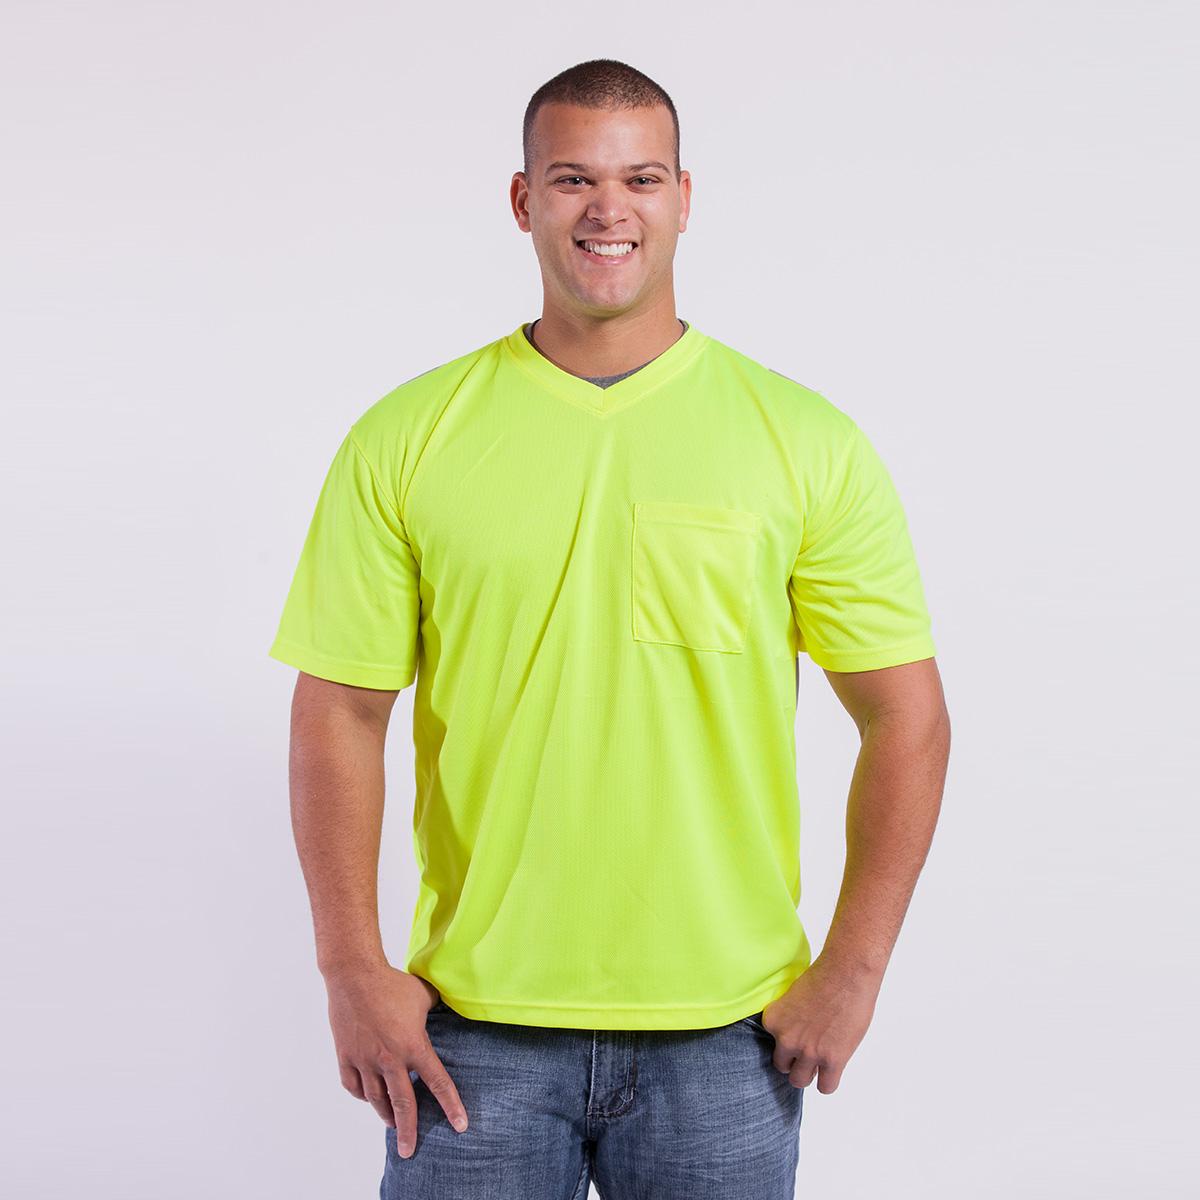 T-Shirt-Short-Sleeve-Performance-Fabric-yellow-front